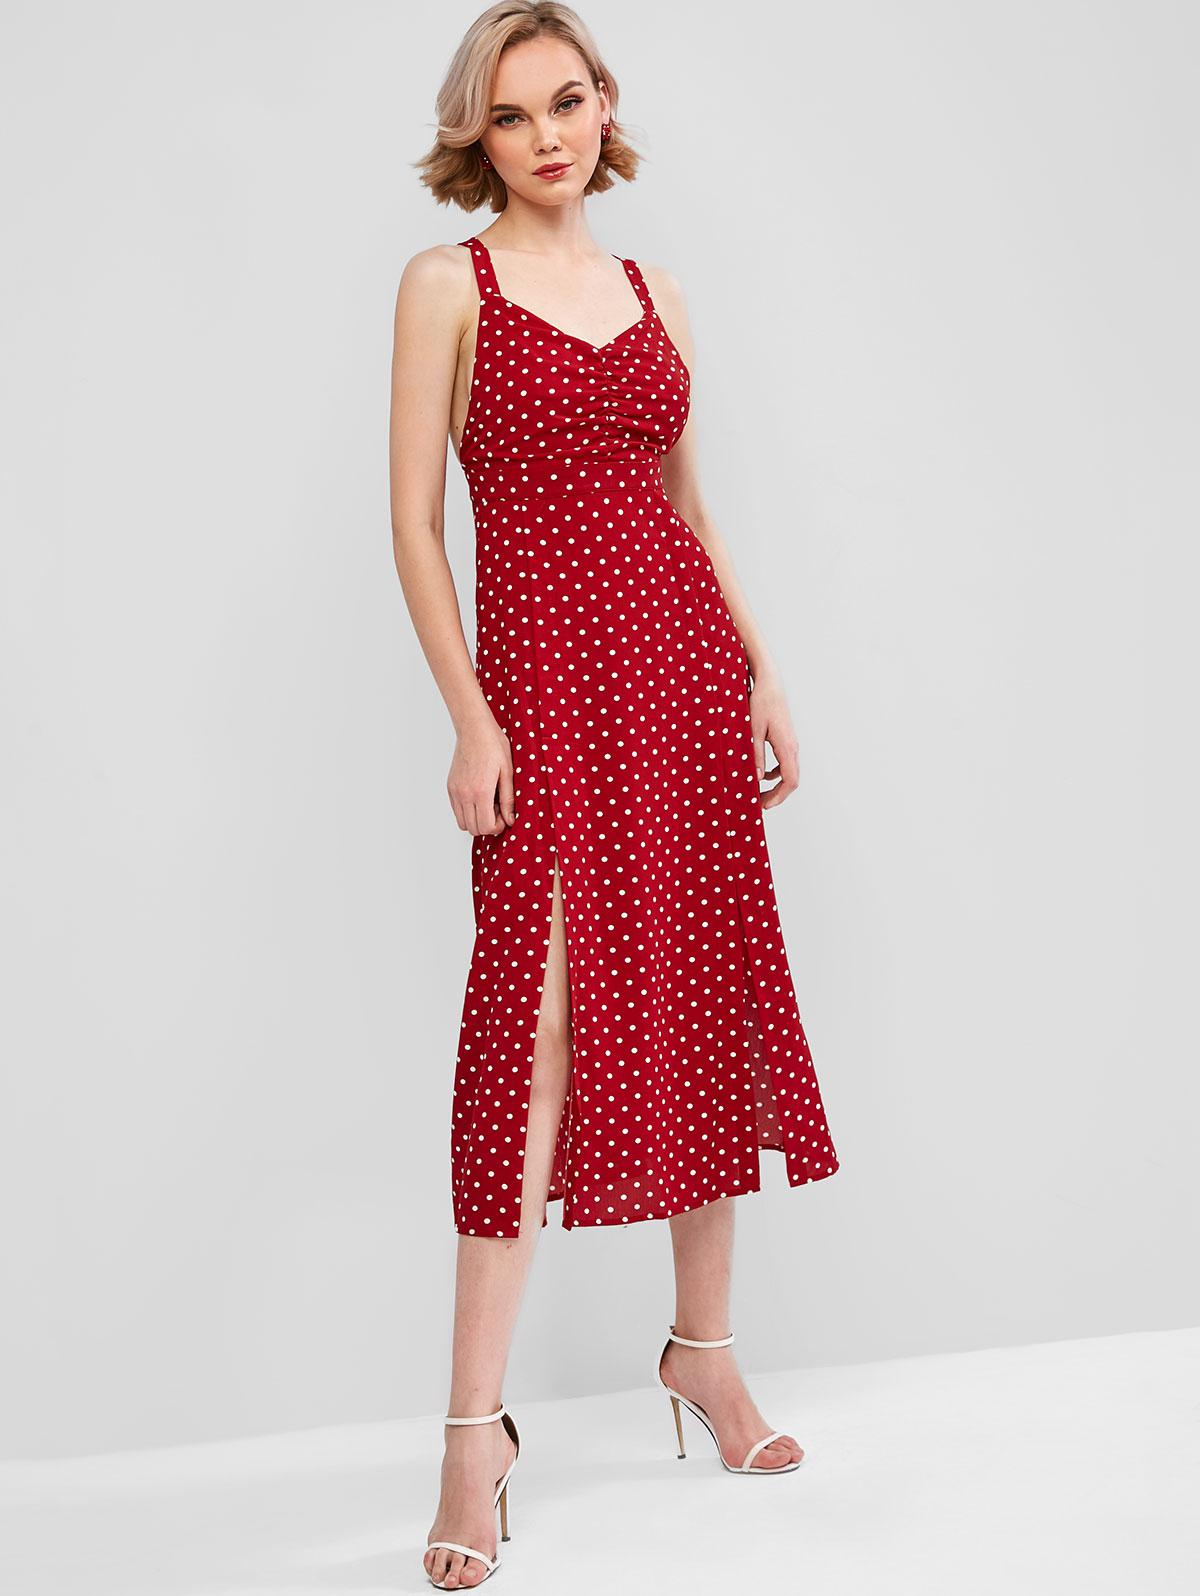 Polka Dot Ruched Slits Sleeveless Dress